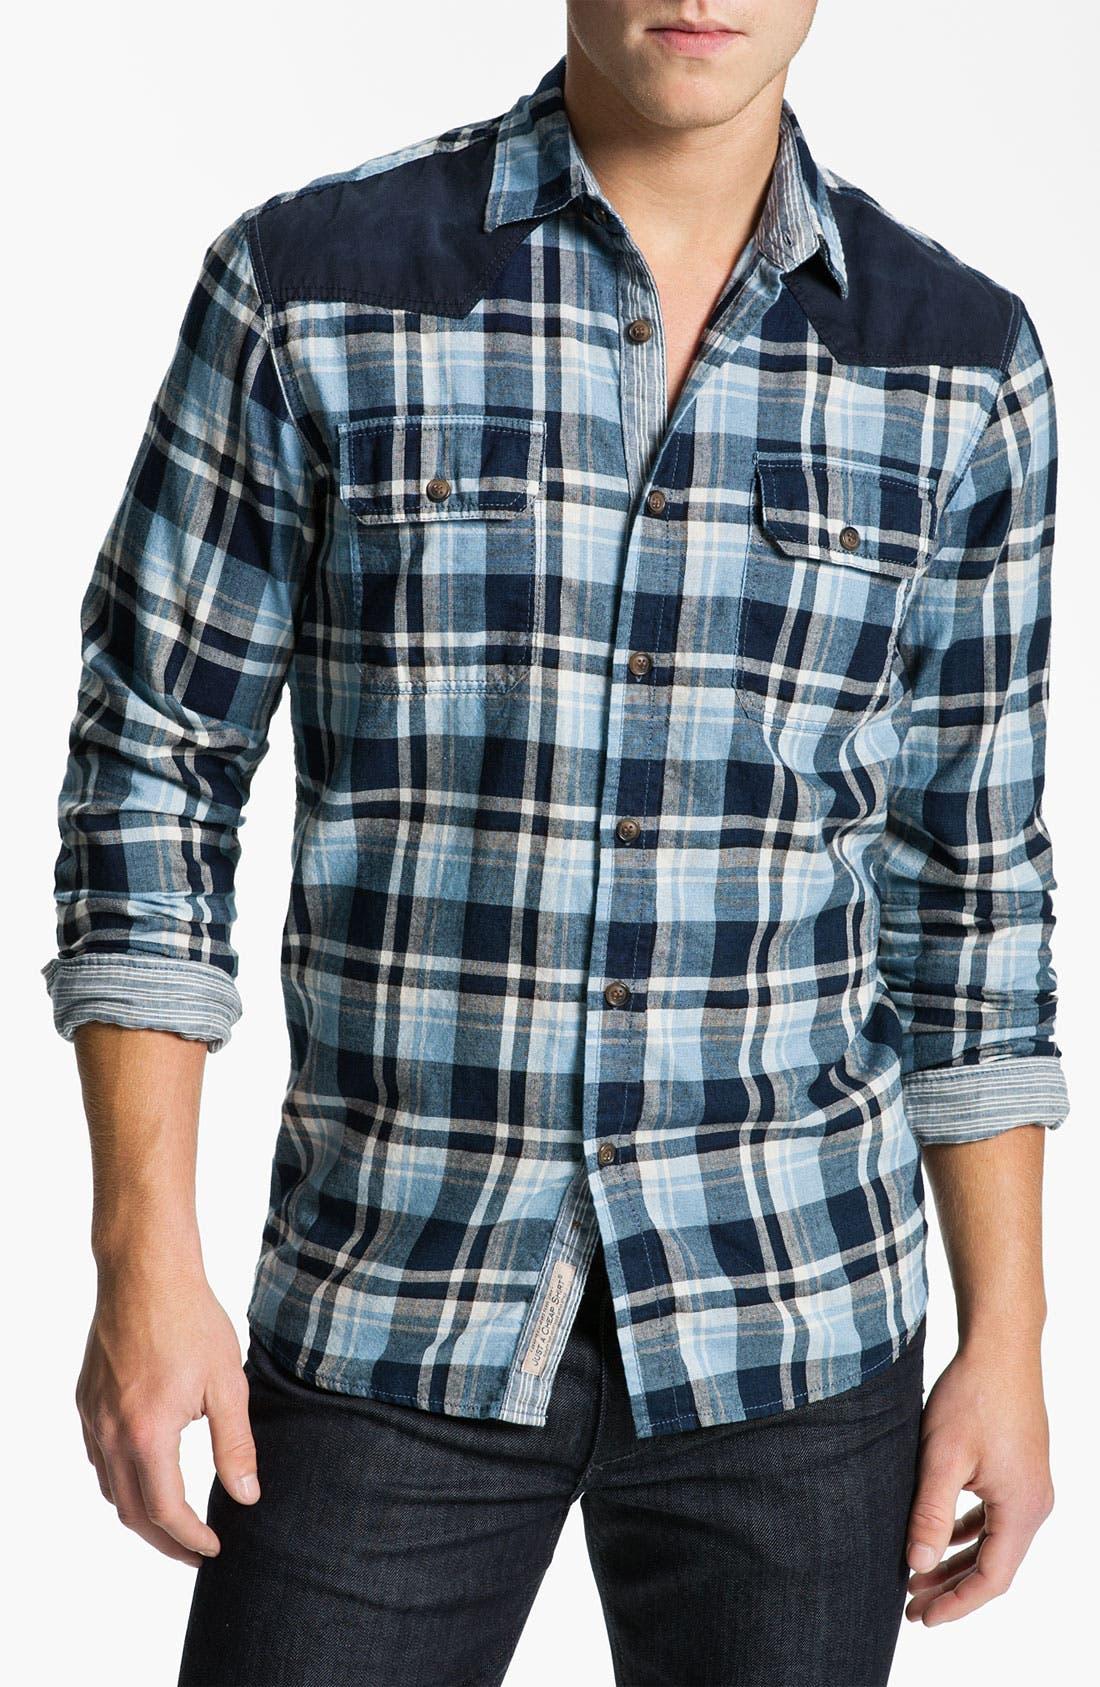 Main Image - Just A Cheap Shirt Long Sleeve Woven Shirt